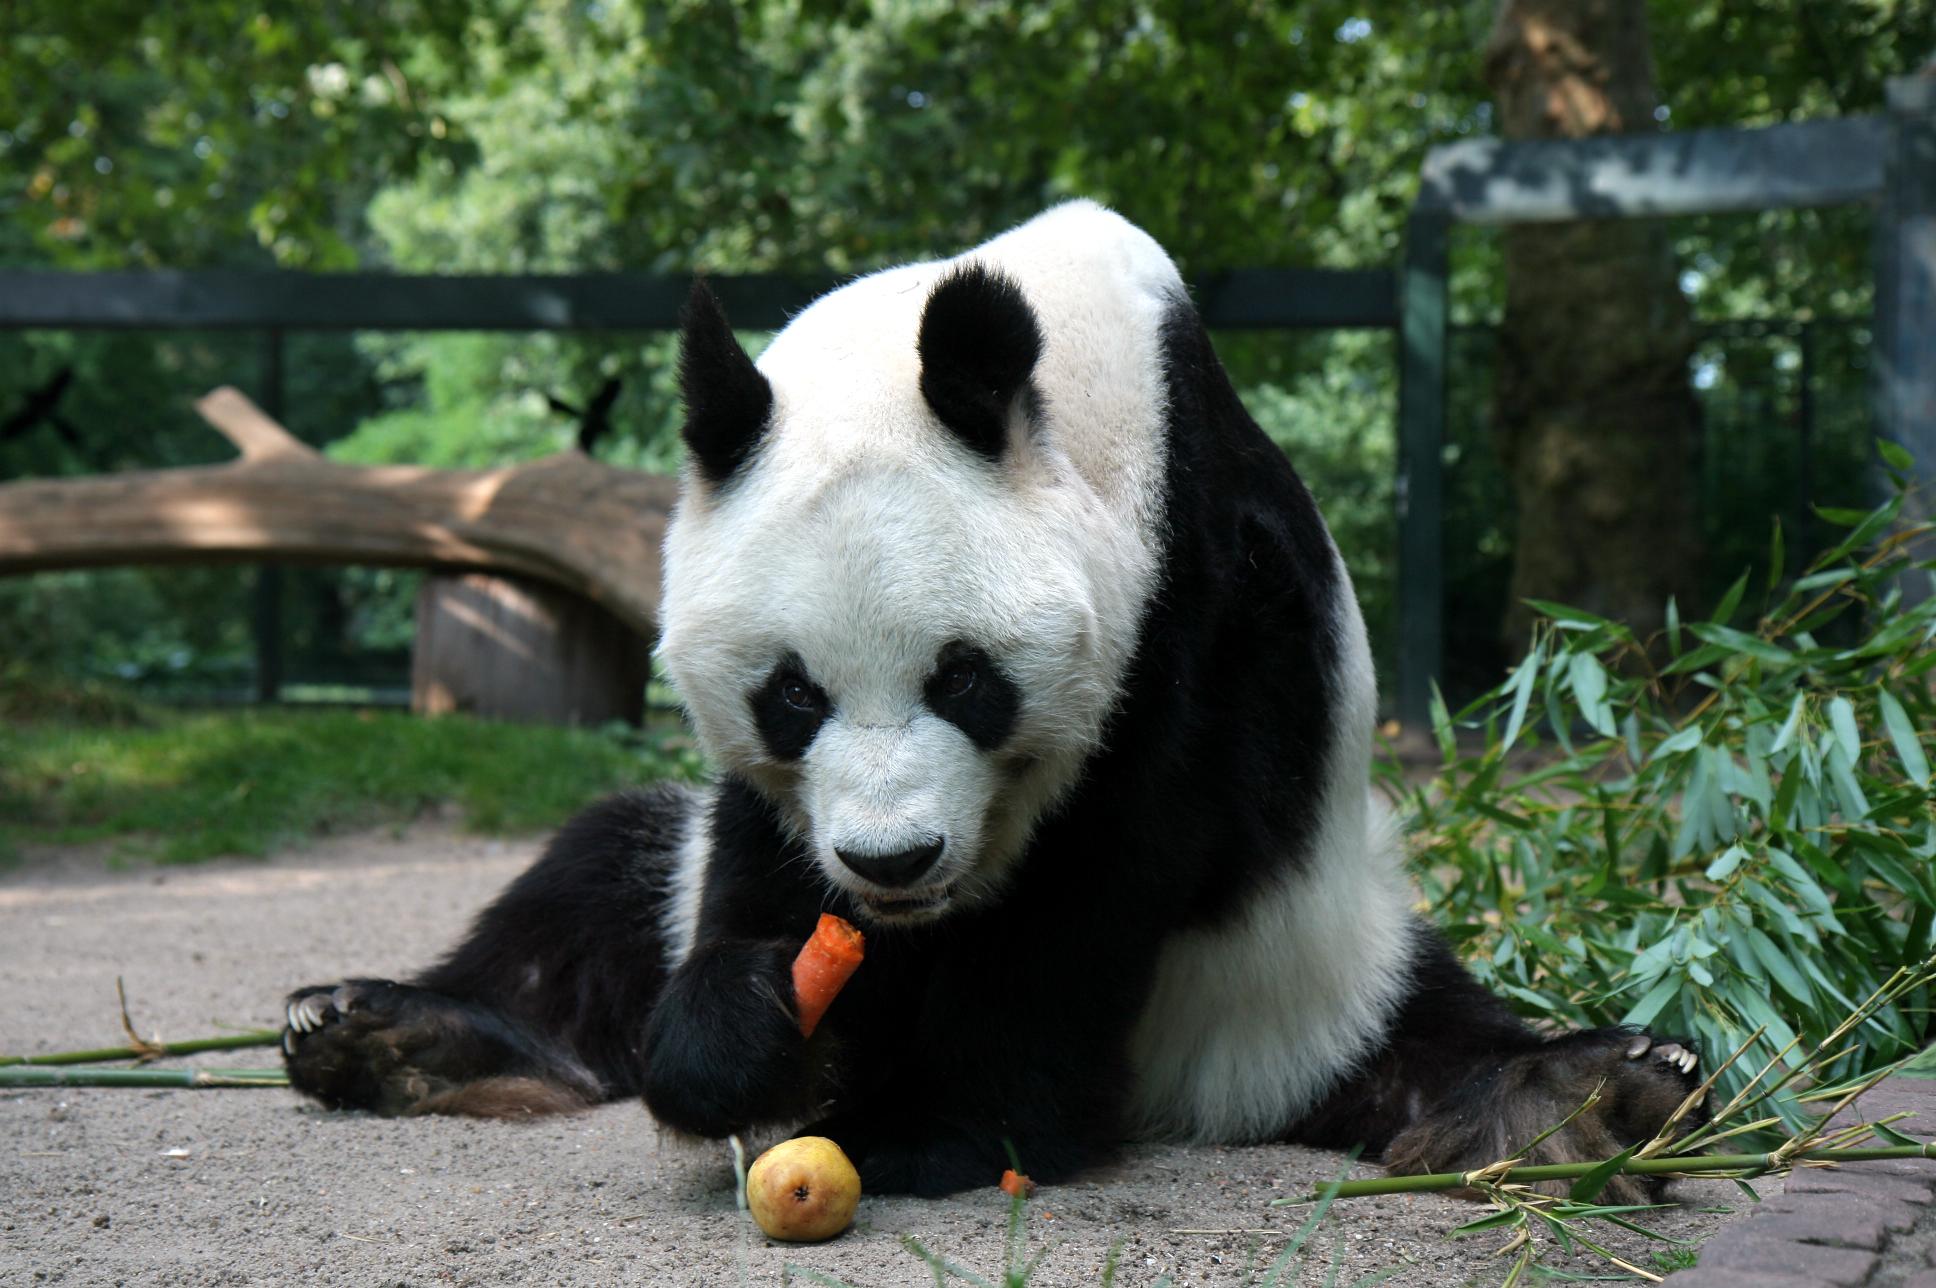 Giant Panda Bear Photo Gallery